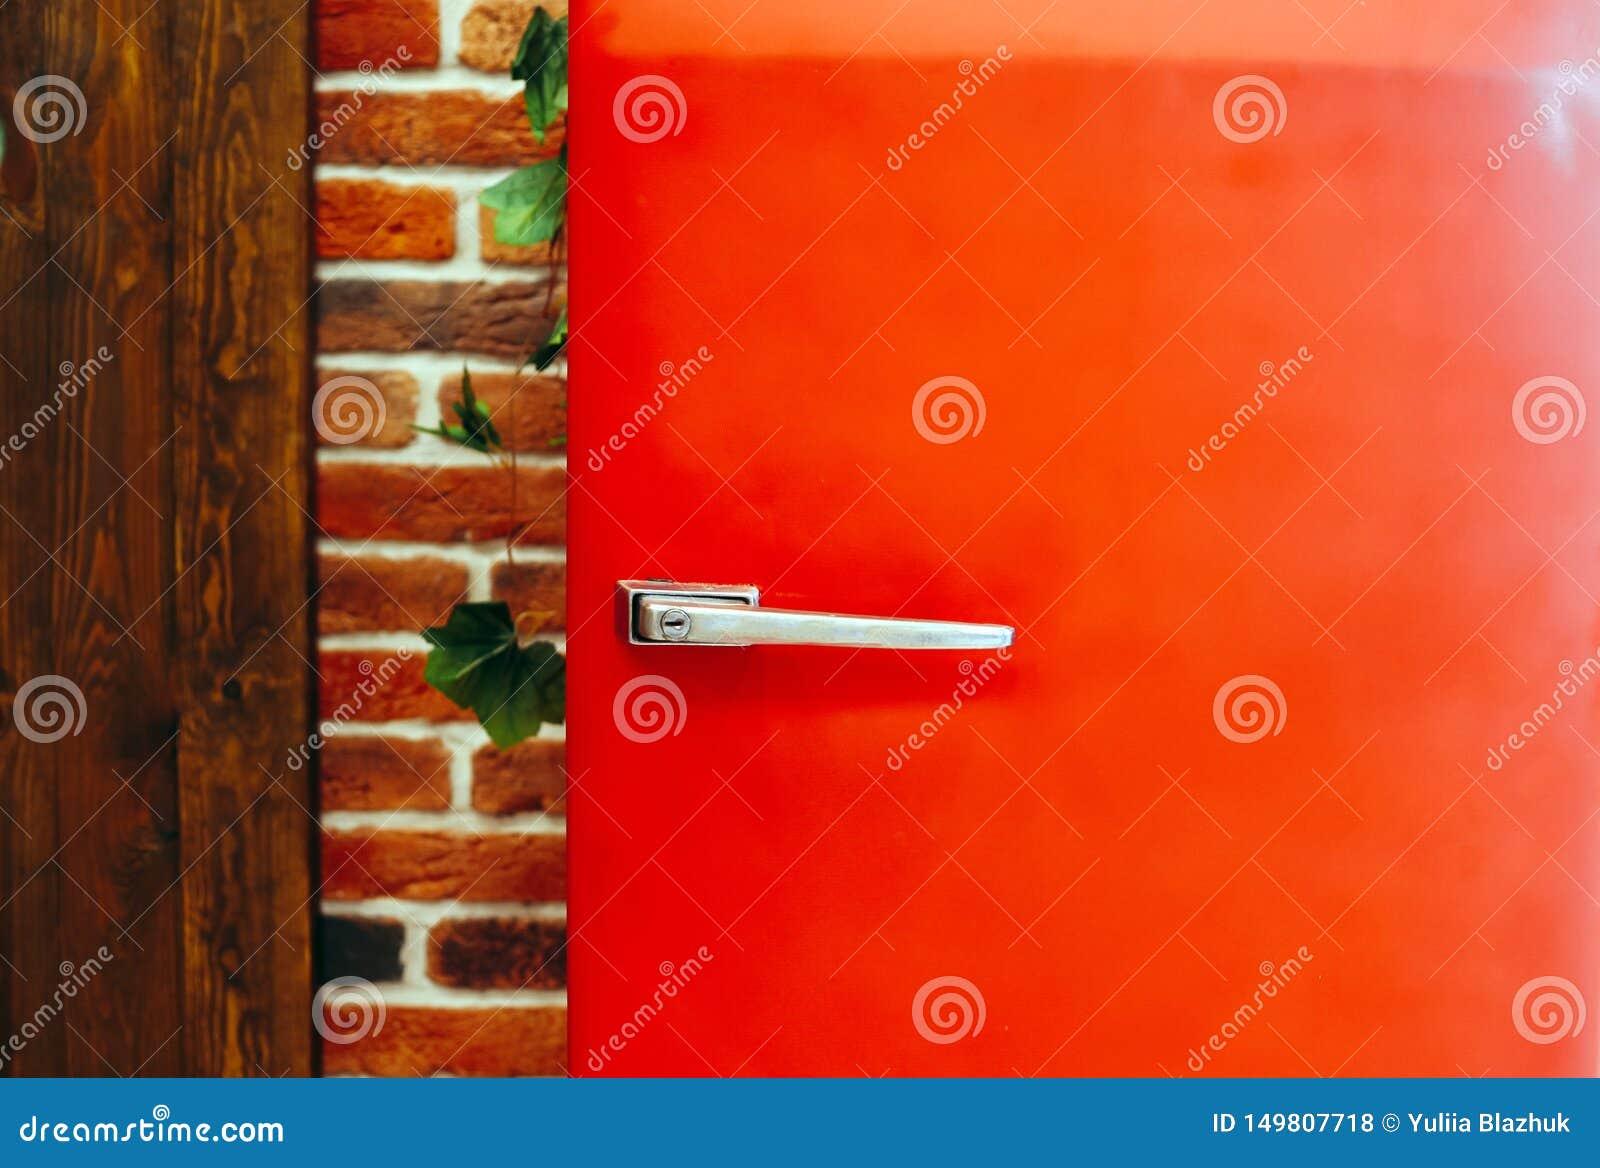 Retro vintage style red fridge against brick wall background